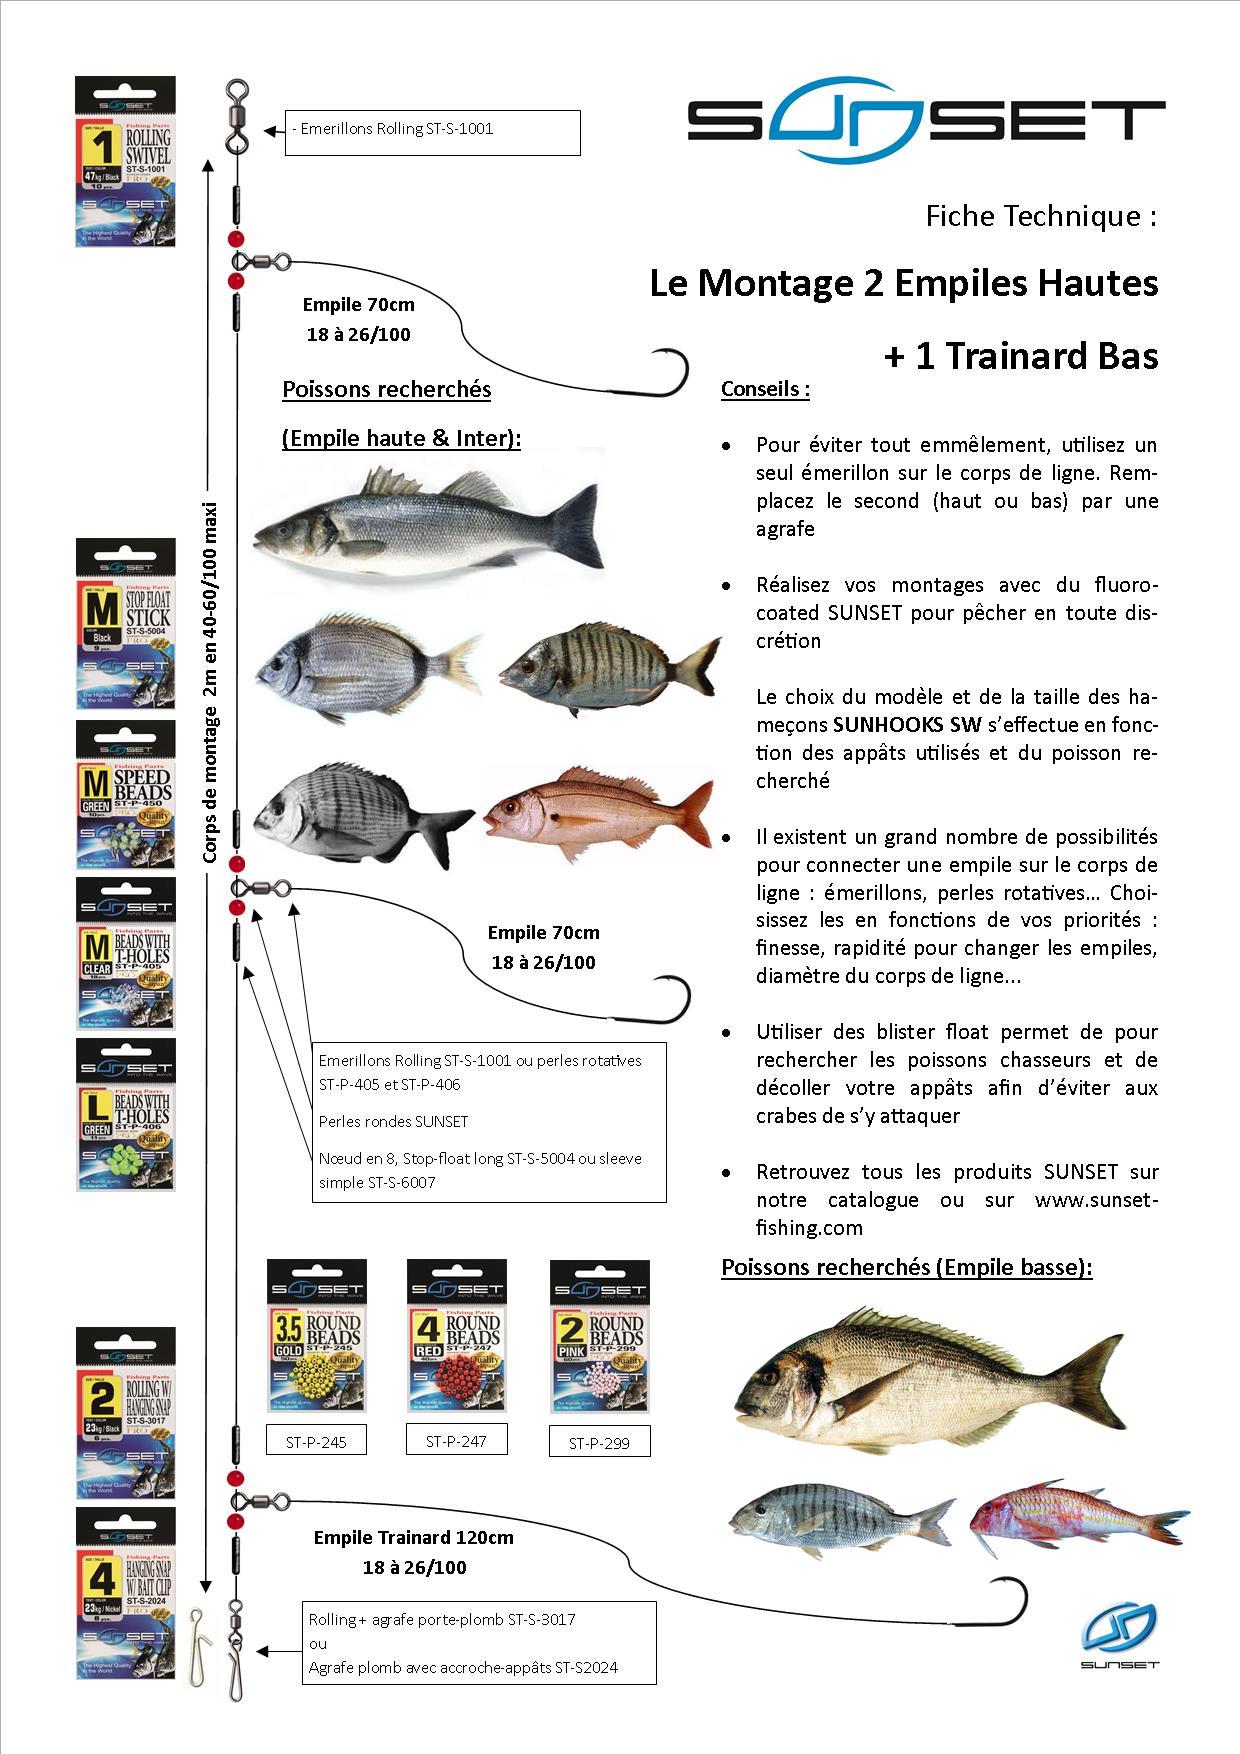 3-LE MONTAGE 2 EMPILES HAUTES + 1 TRAINARD BAS.jpg